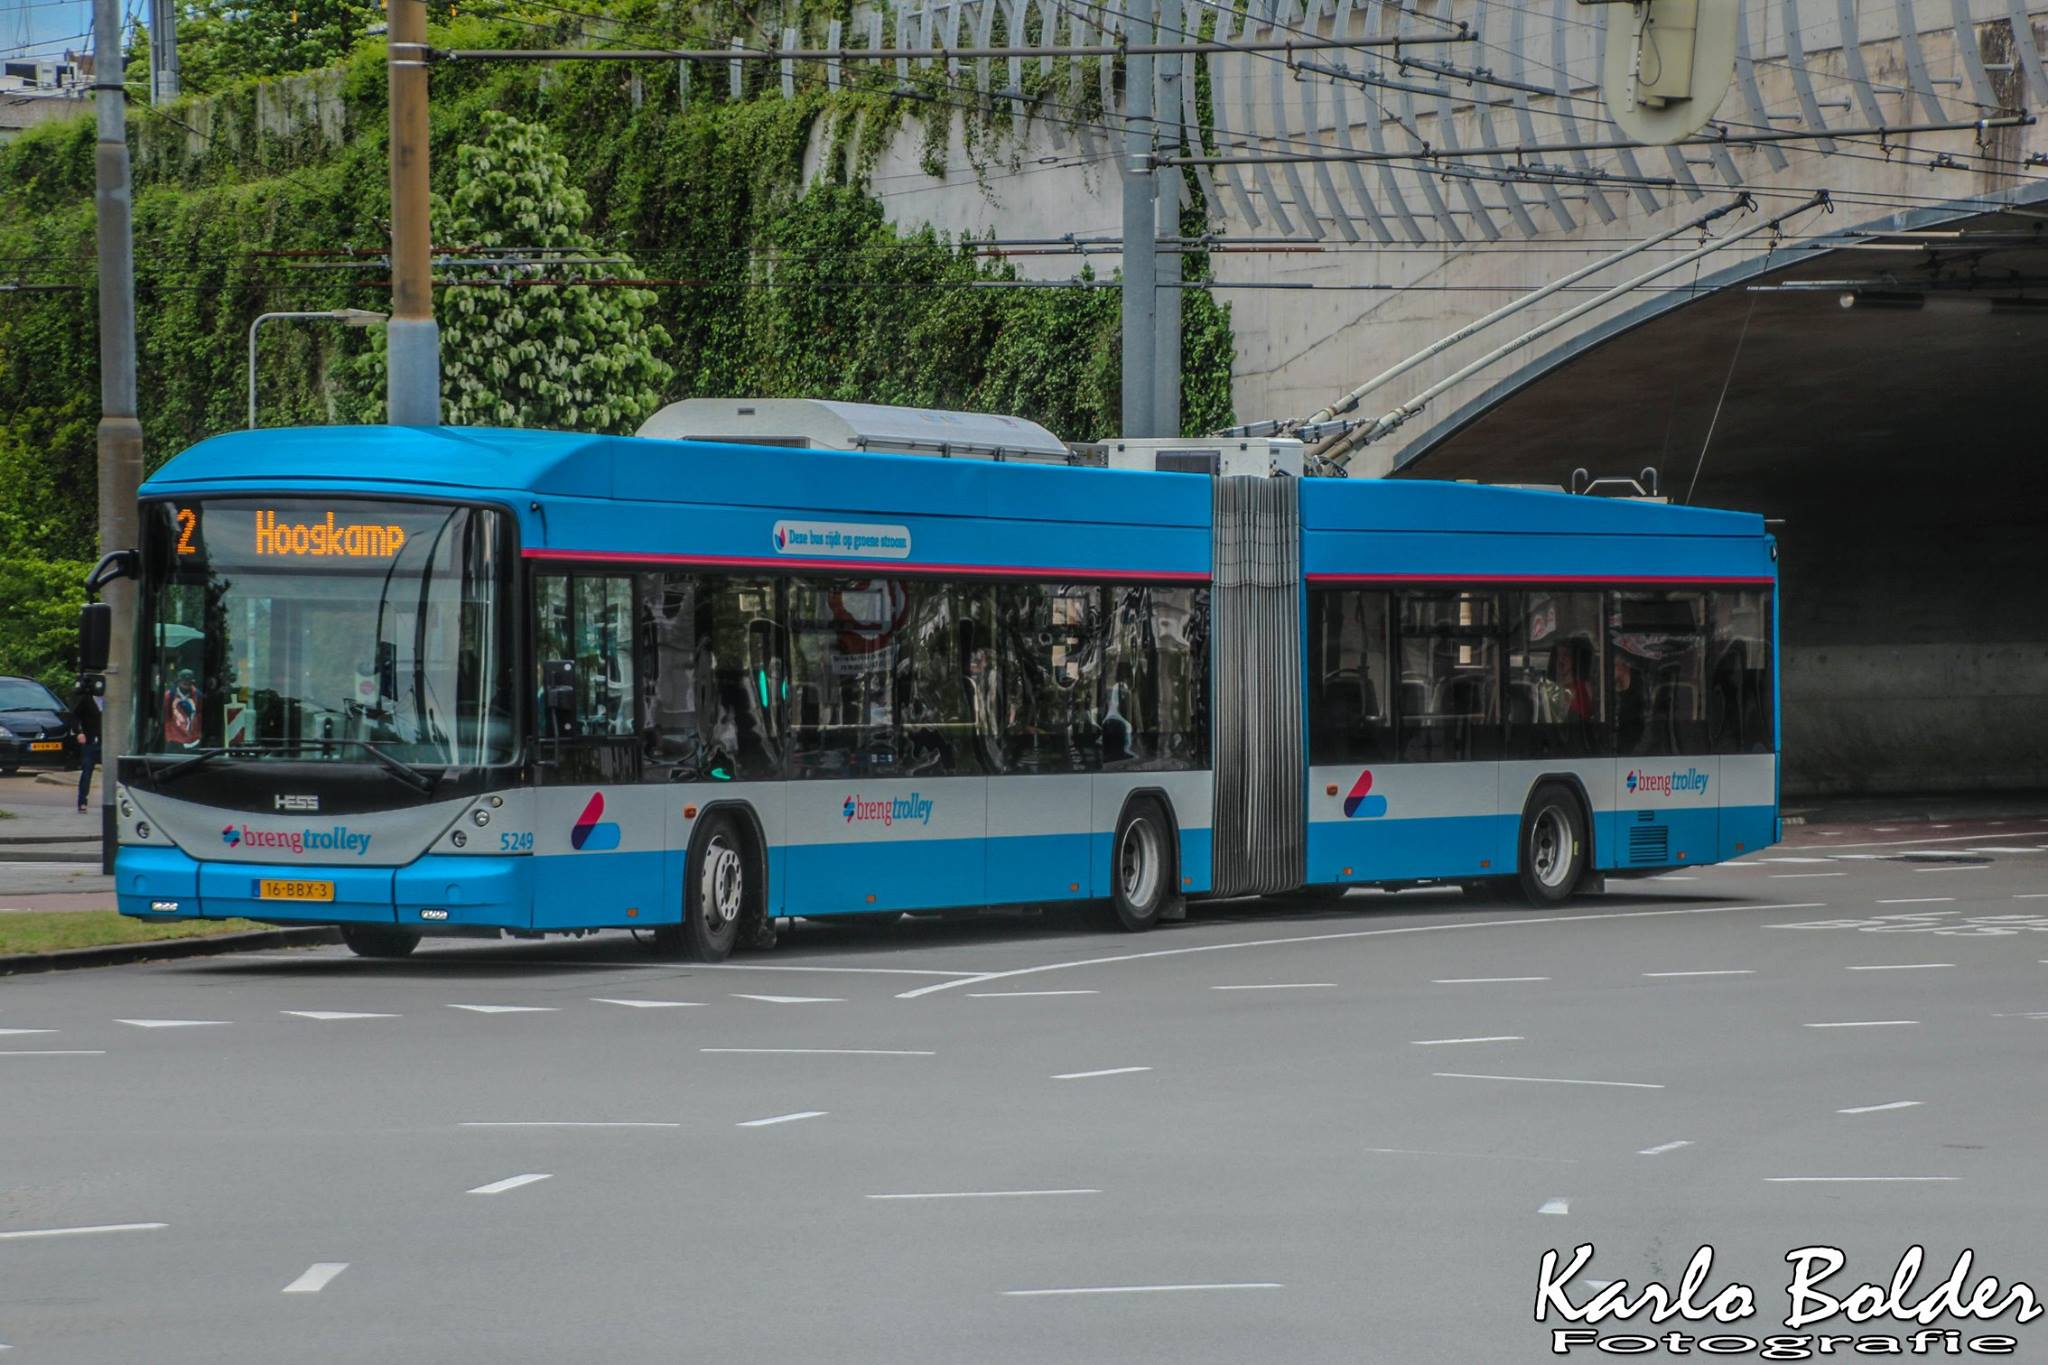 Donderdag 4 januari geen bus- en treinvervoer